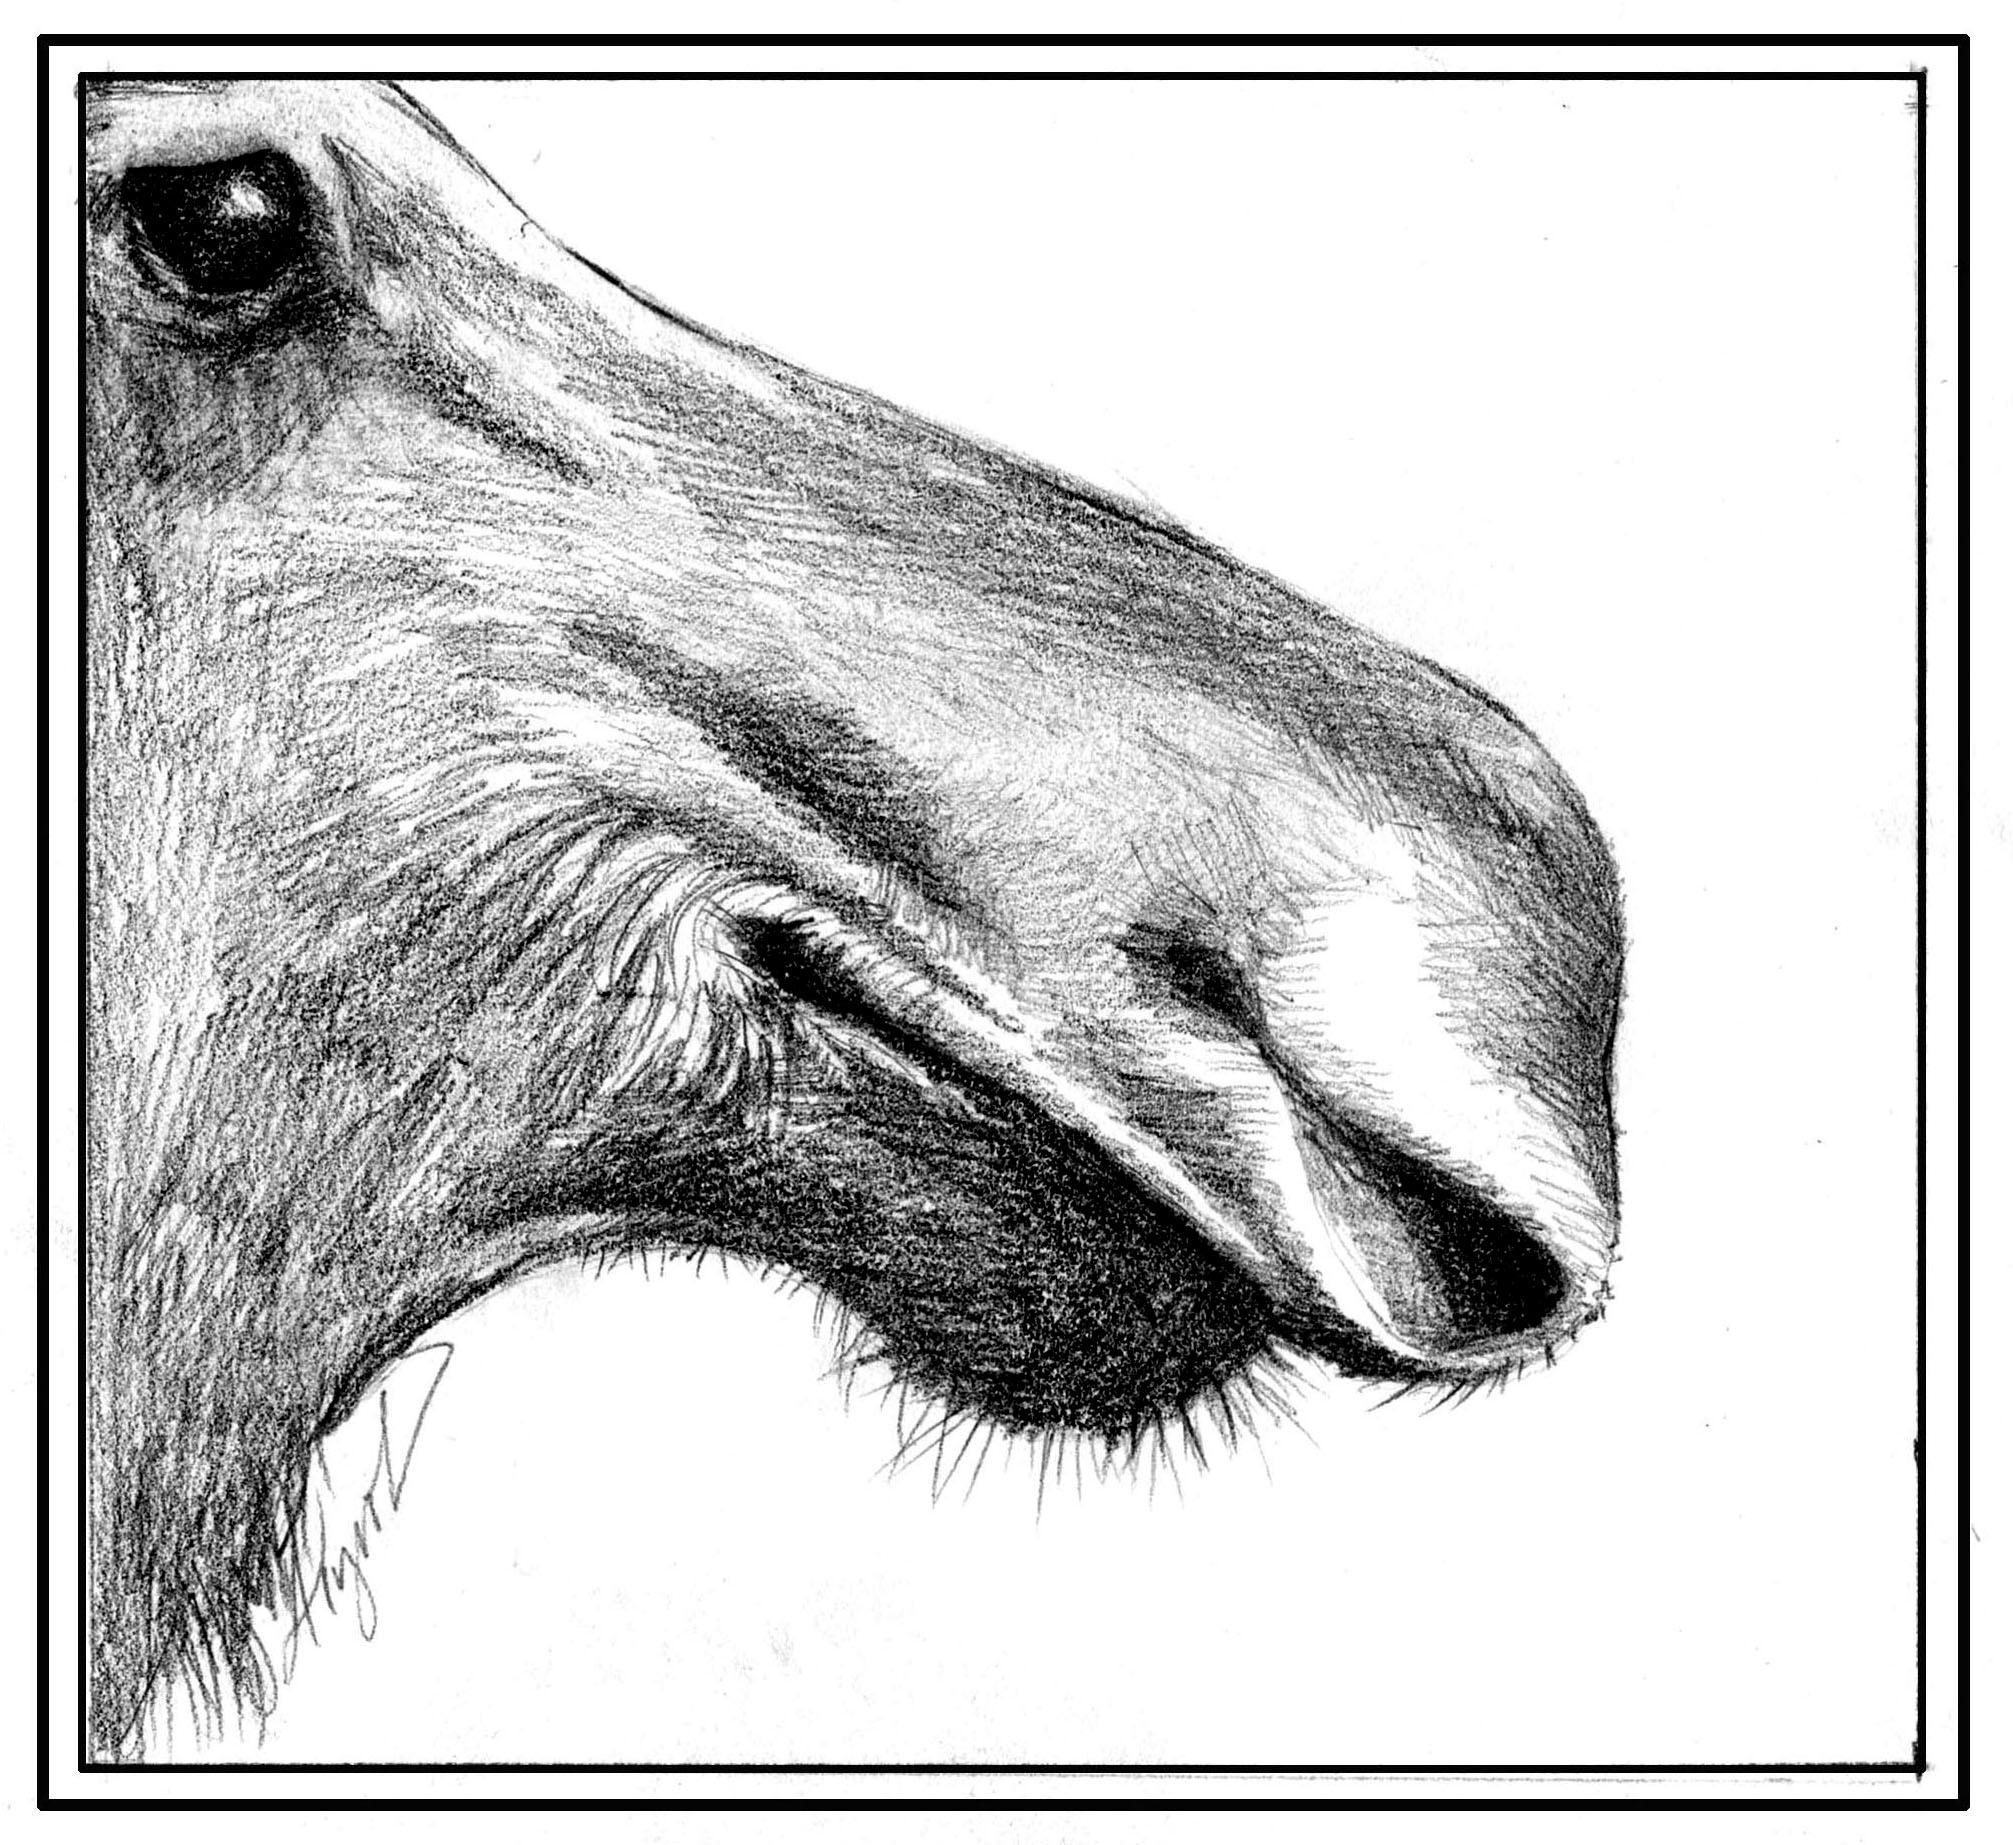 Adirondack Moose Why The Big Nose The Adirondack Almanack